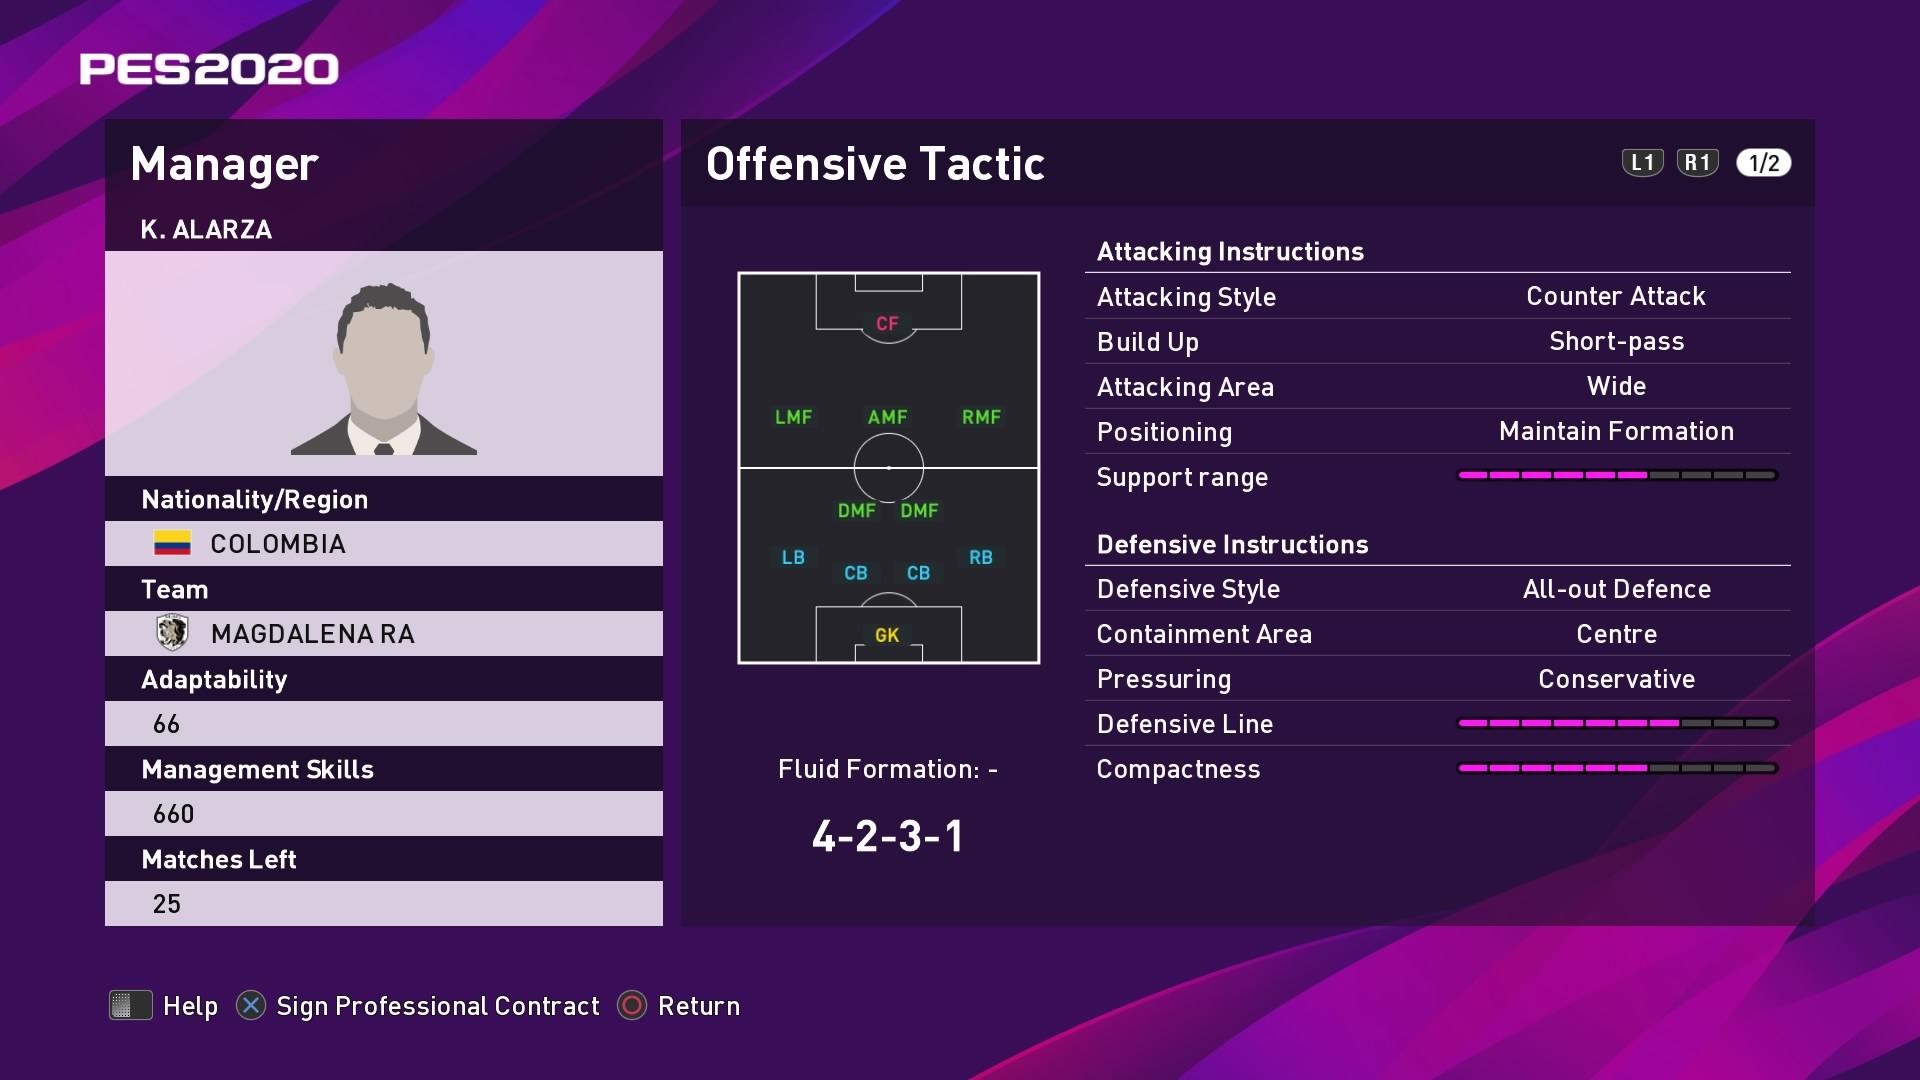 K. Alarza (Carlos Silva) Offensive Tactic in PES 2020 myClub